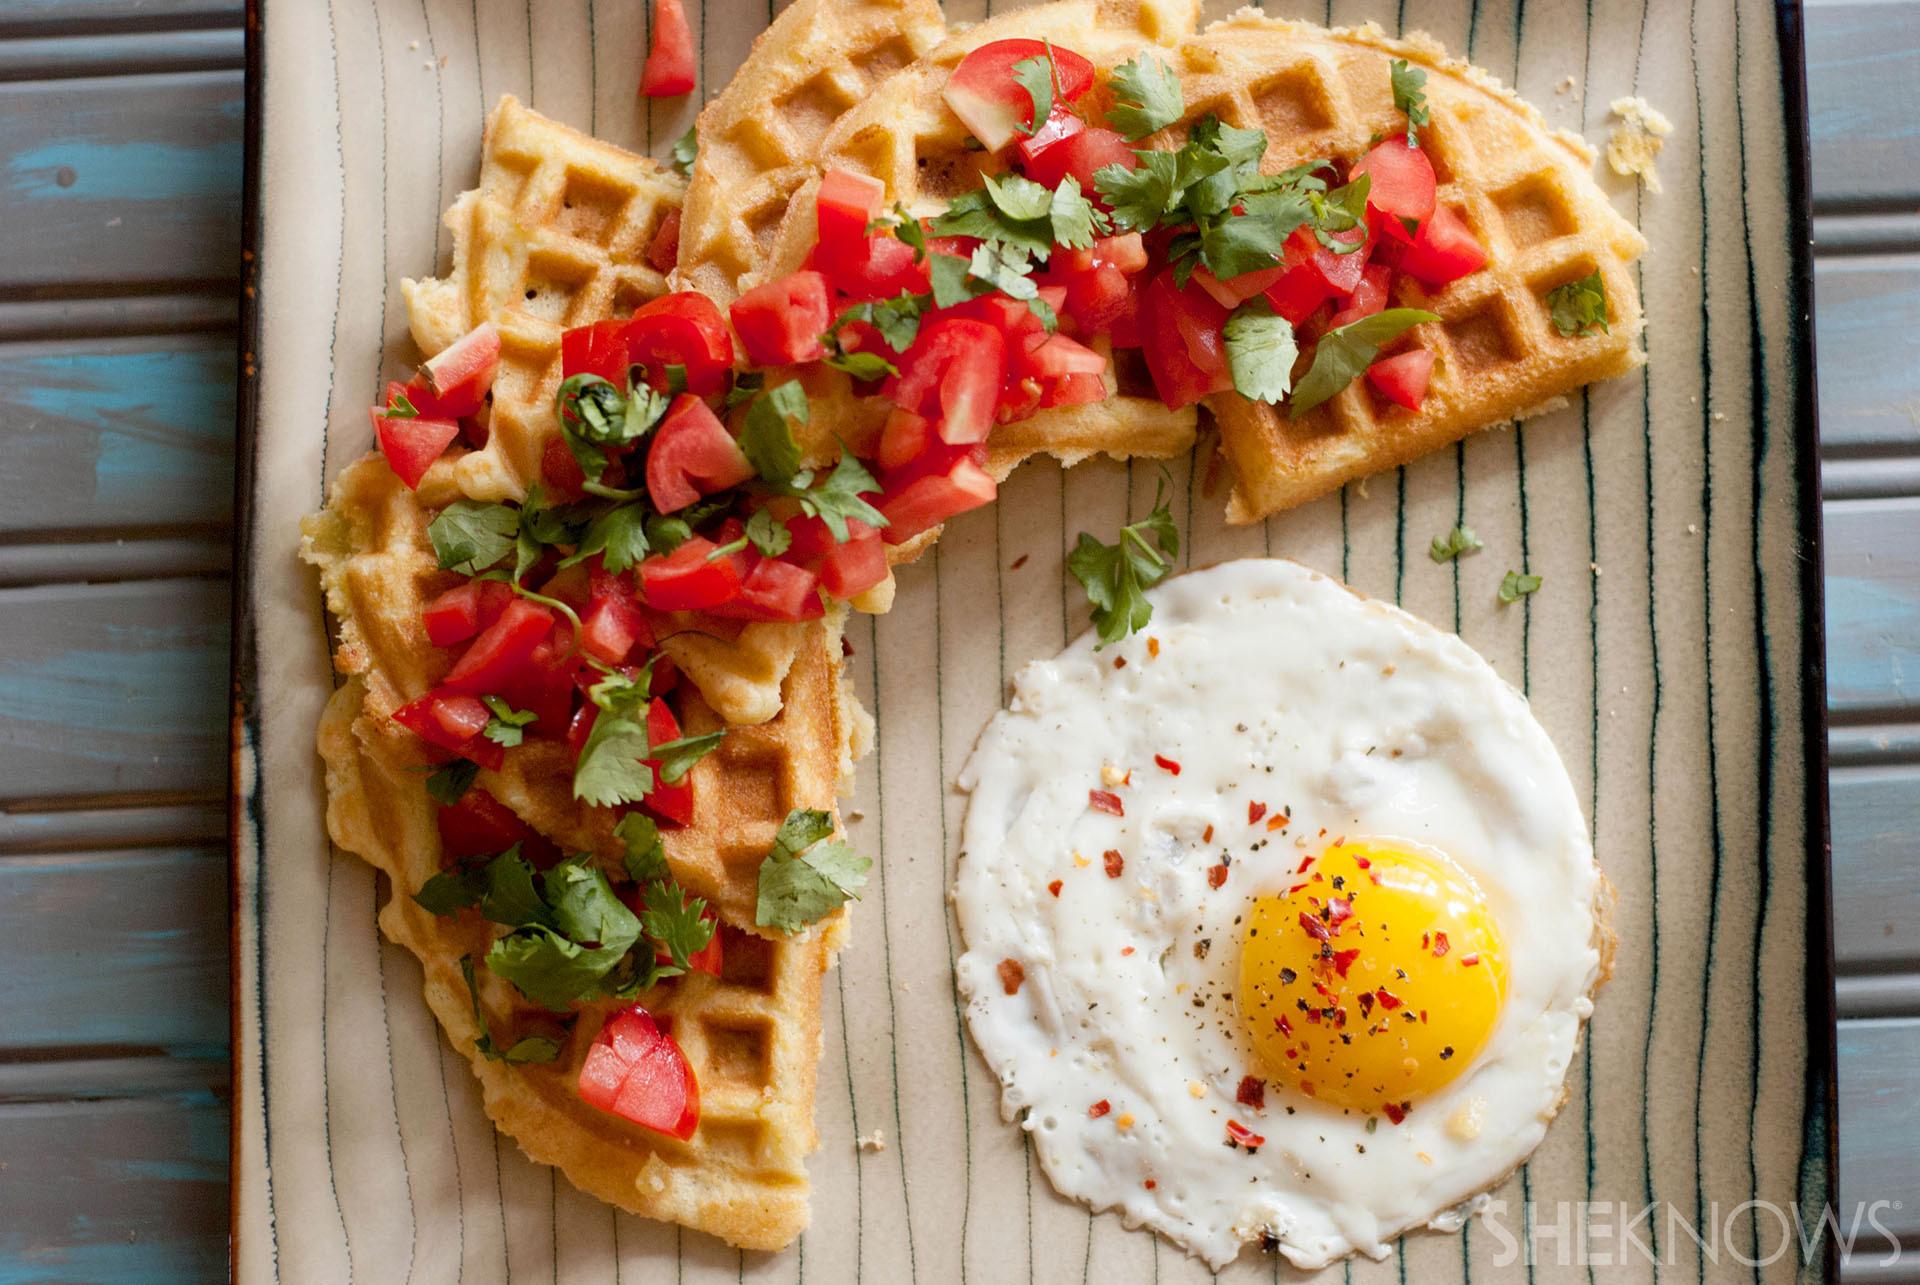 Savory green chili cheddar corn bread waffles recipe